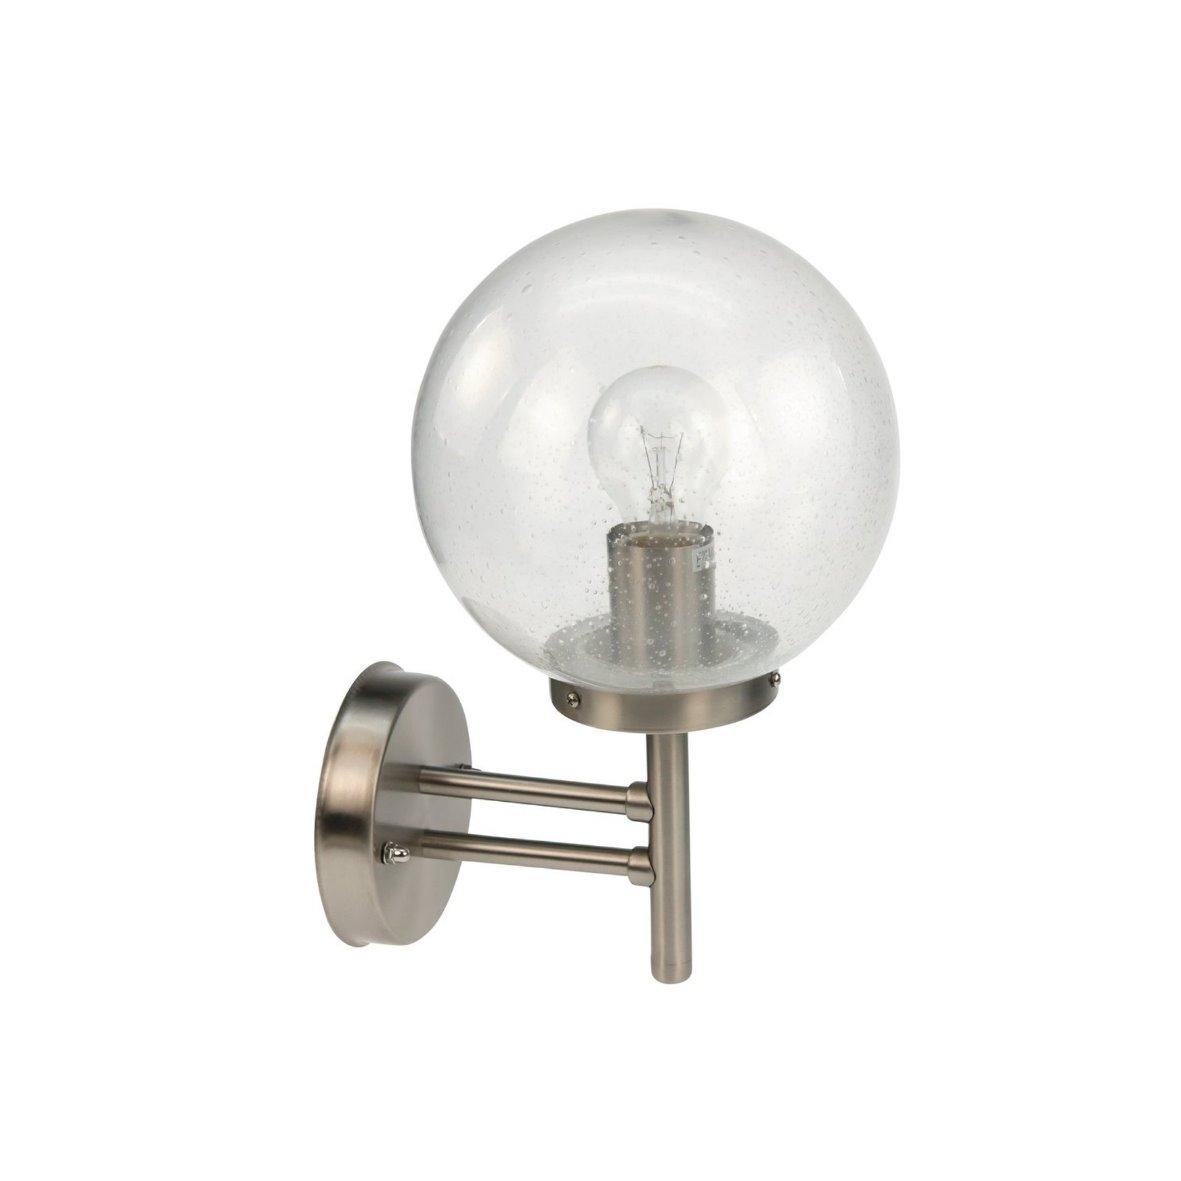 aussenleuchte aussenlampe aussen wand lampe leuchte wandlampe strahler edelstahl ebay. Black Bedroom Furniture Sets. Home Design Ideas